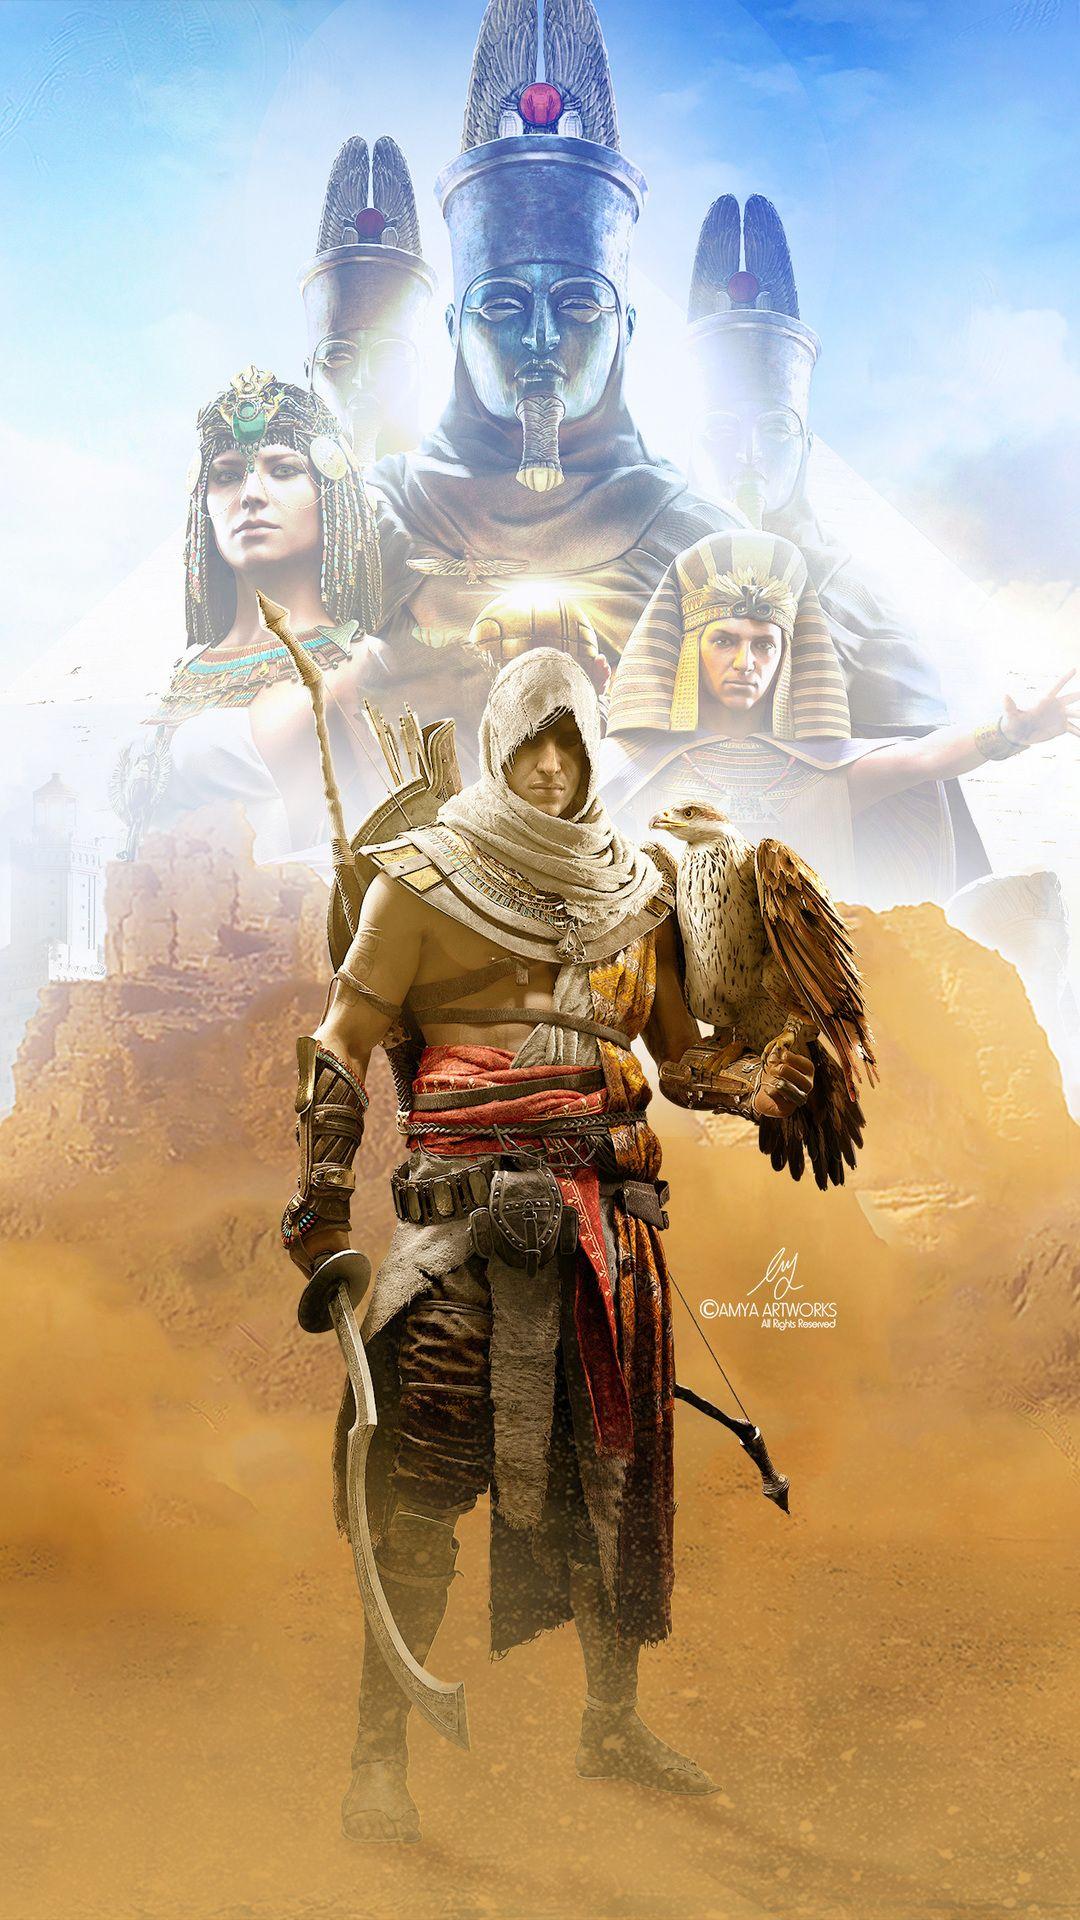 Assassins Creed Wallpaper High Resolution » Hupages